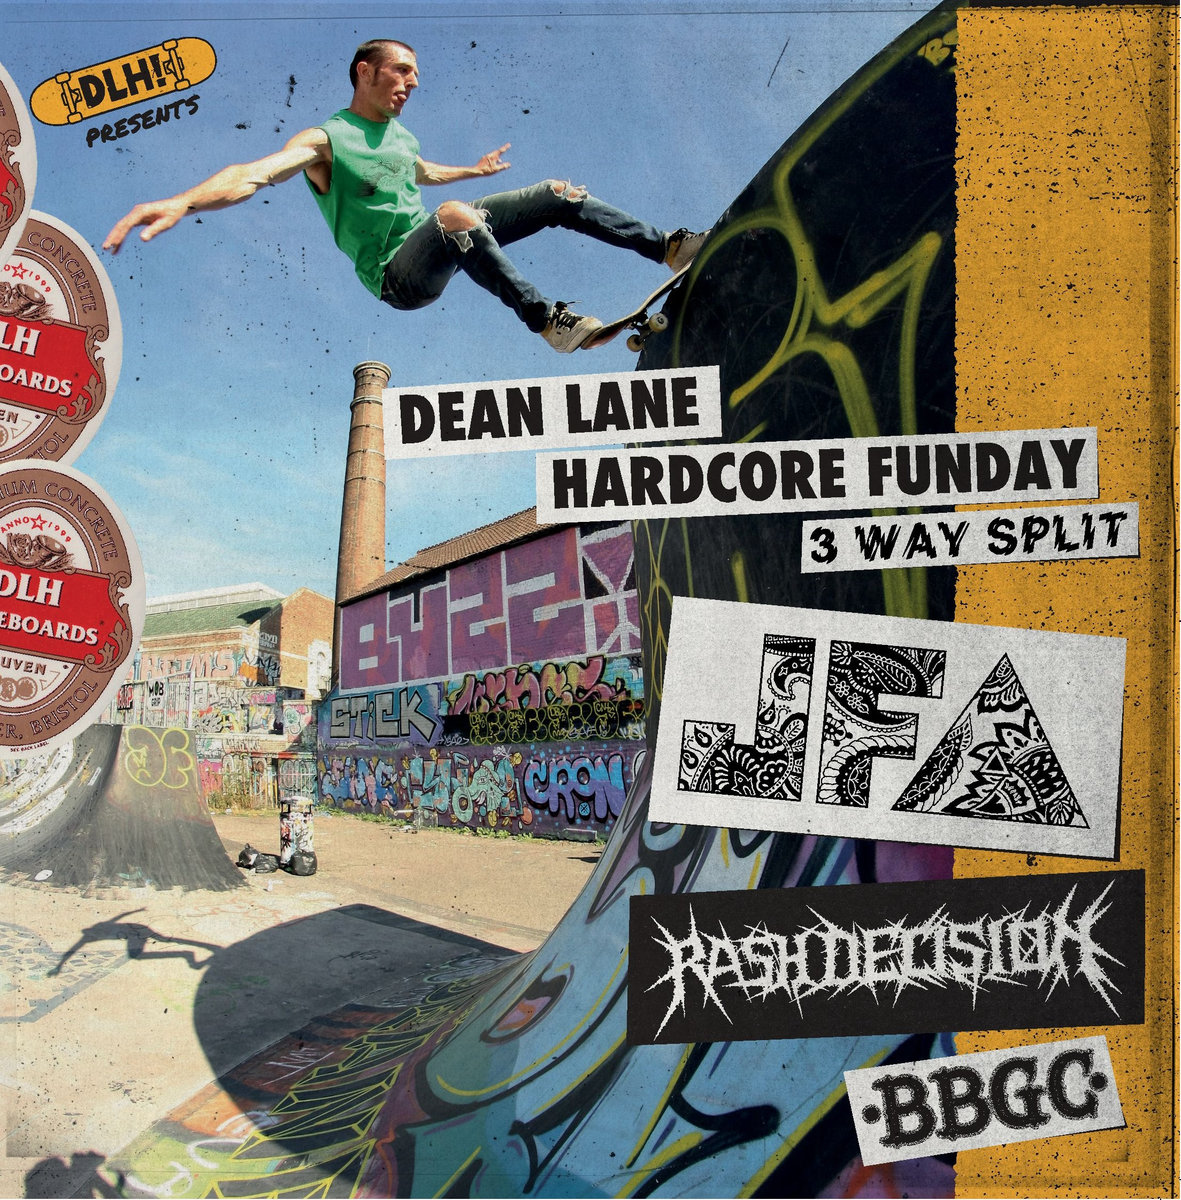 Dean Lane Hardcore Funday